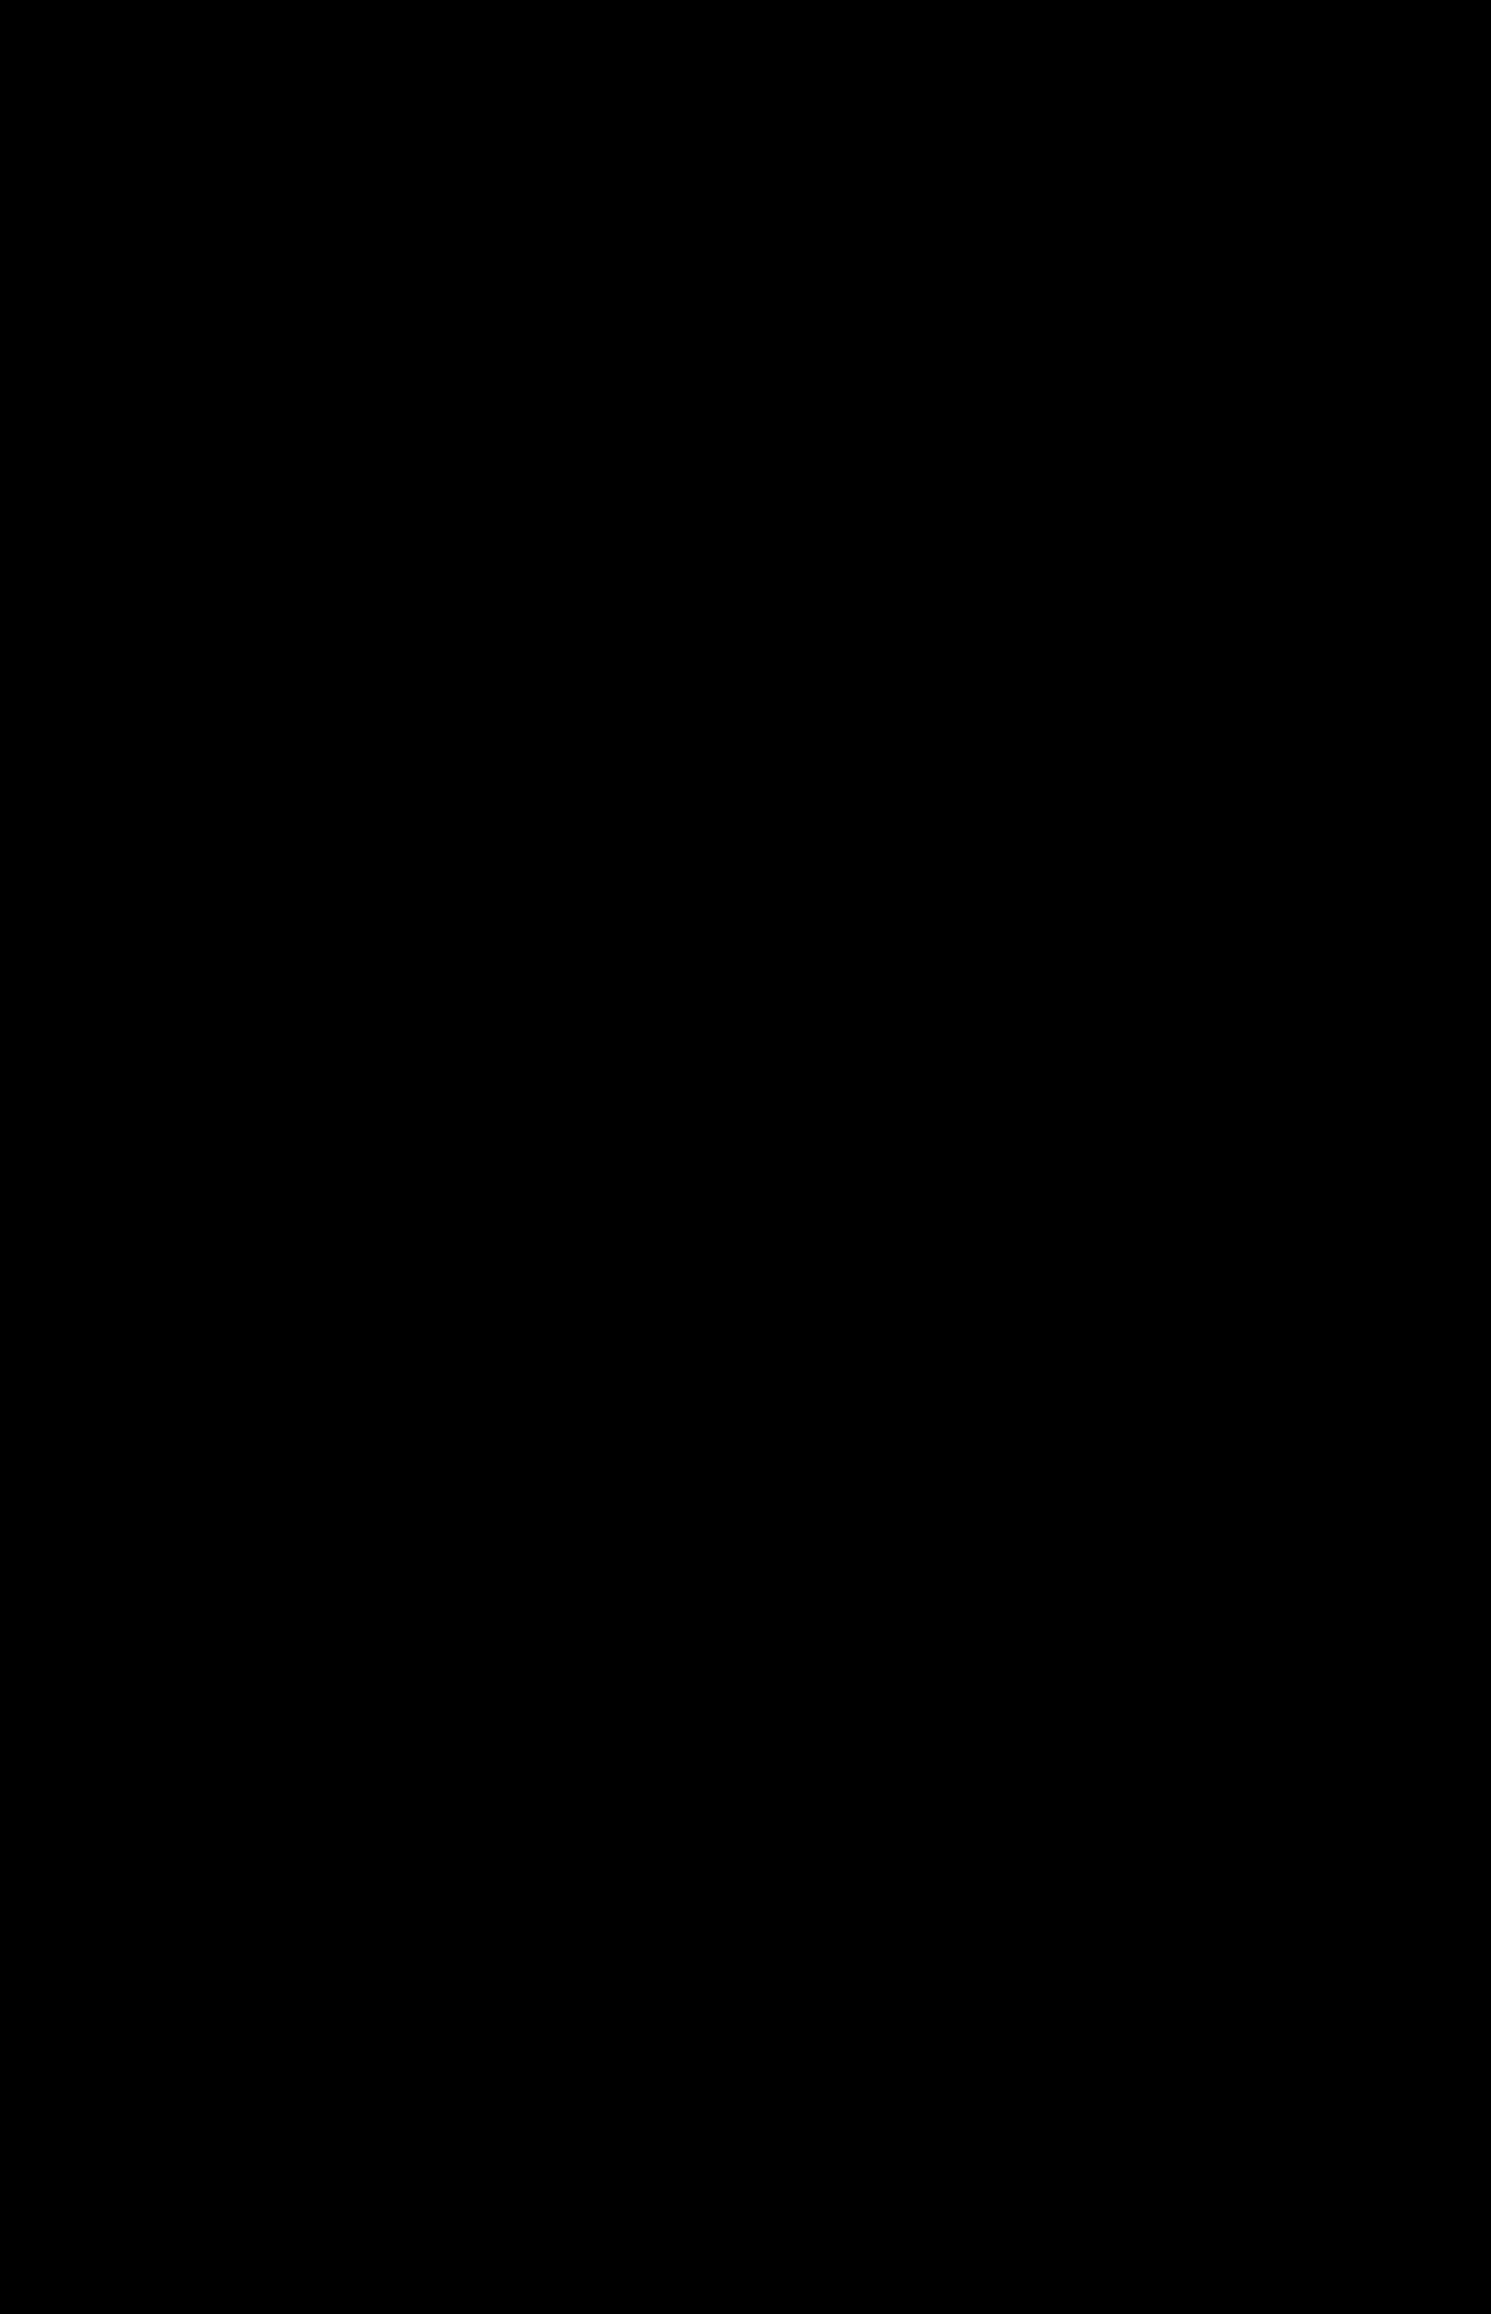 Eagle clipart silhouette. Page of clipartblack com